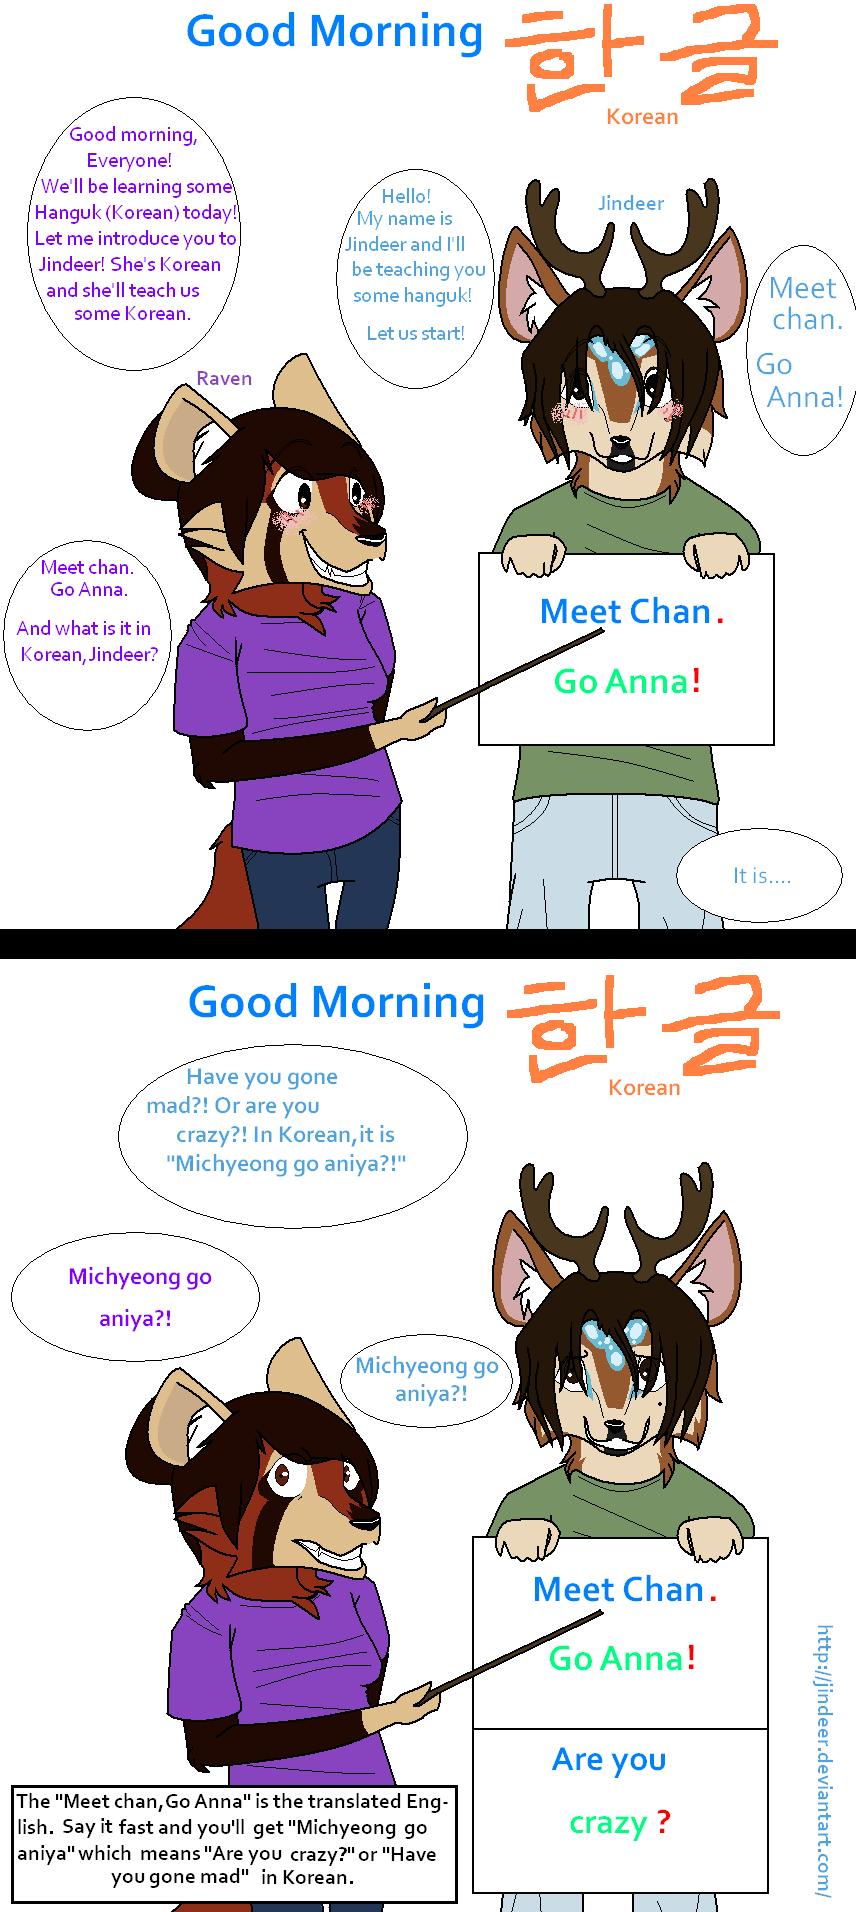 Translation Of Good Morning In Korean : Good morning korean comic by jindeer on deviantart